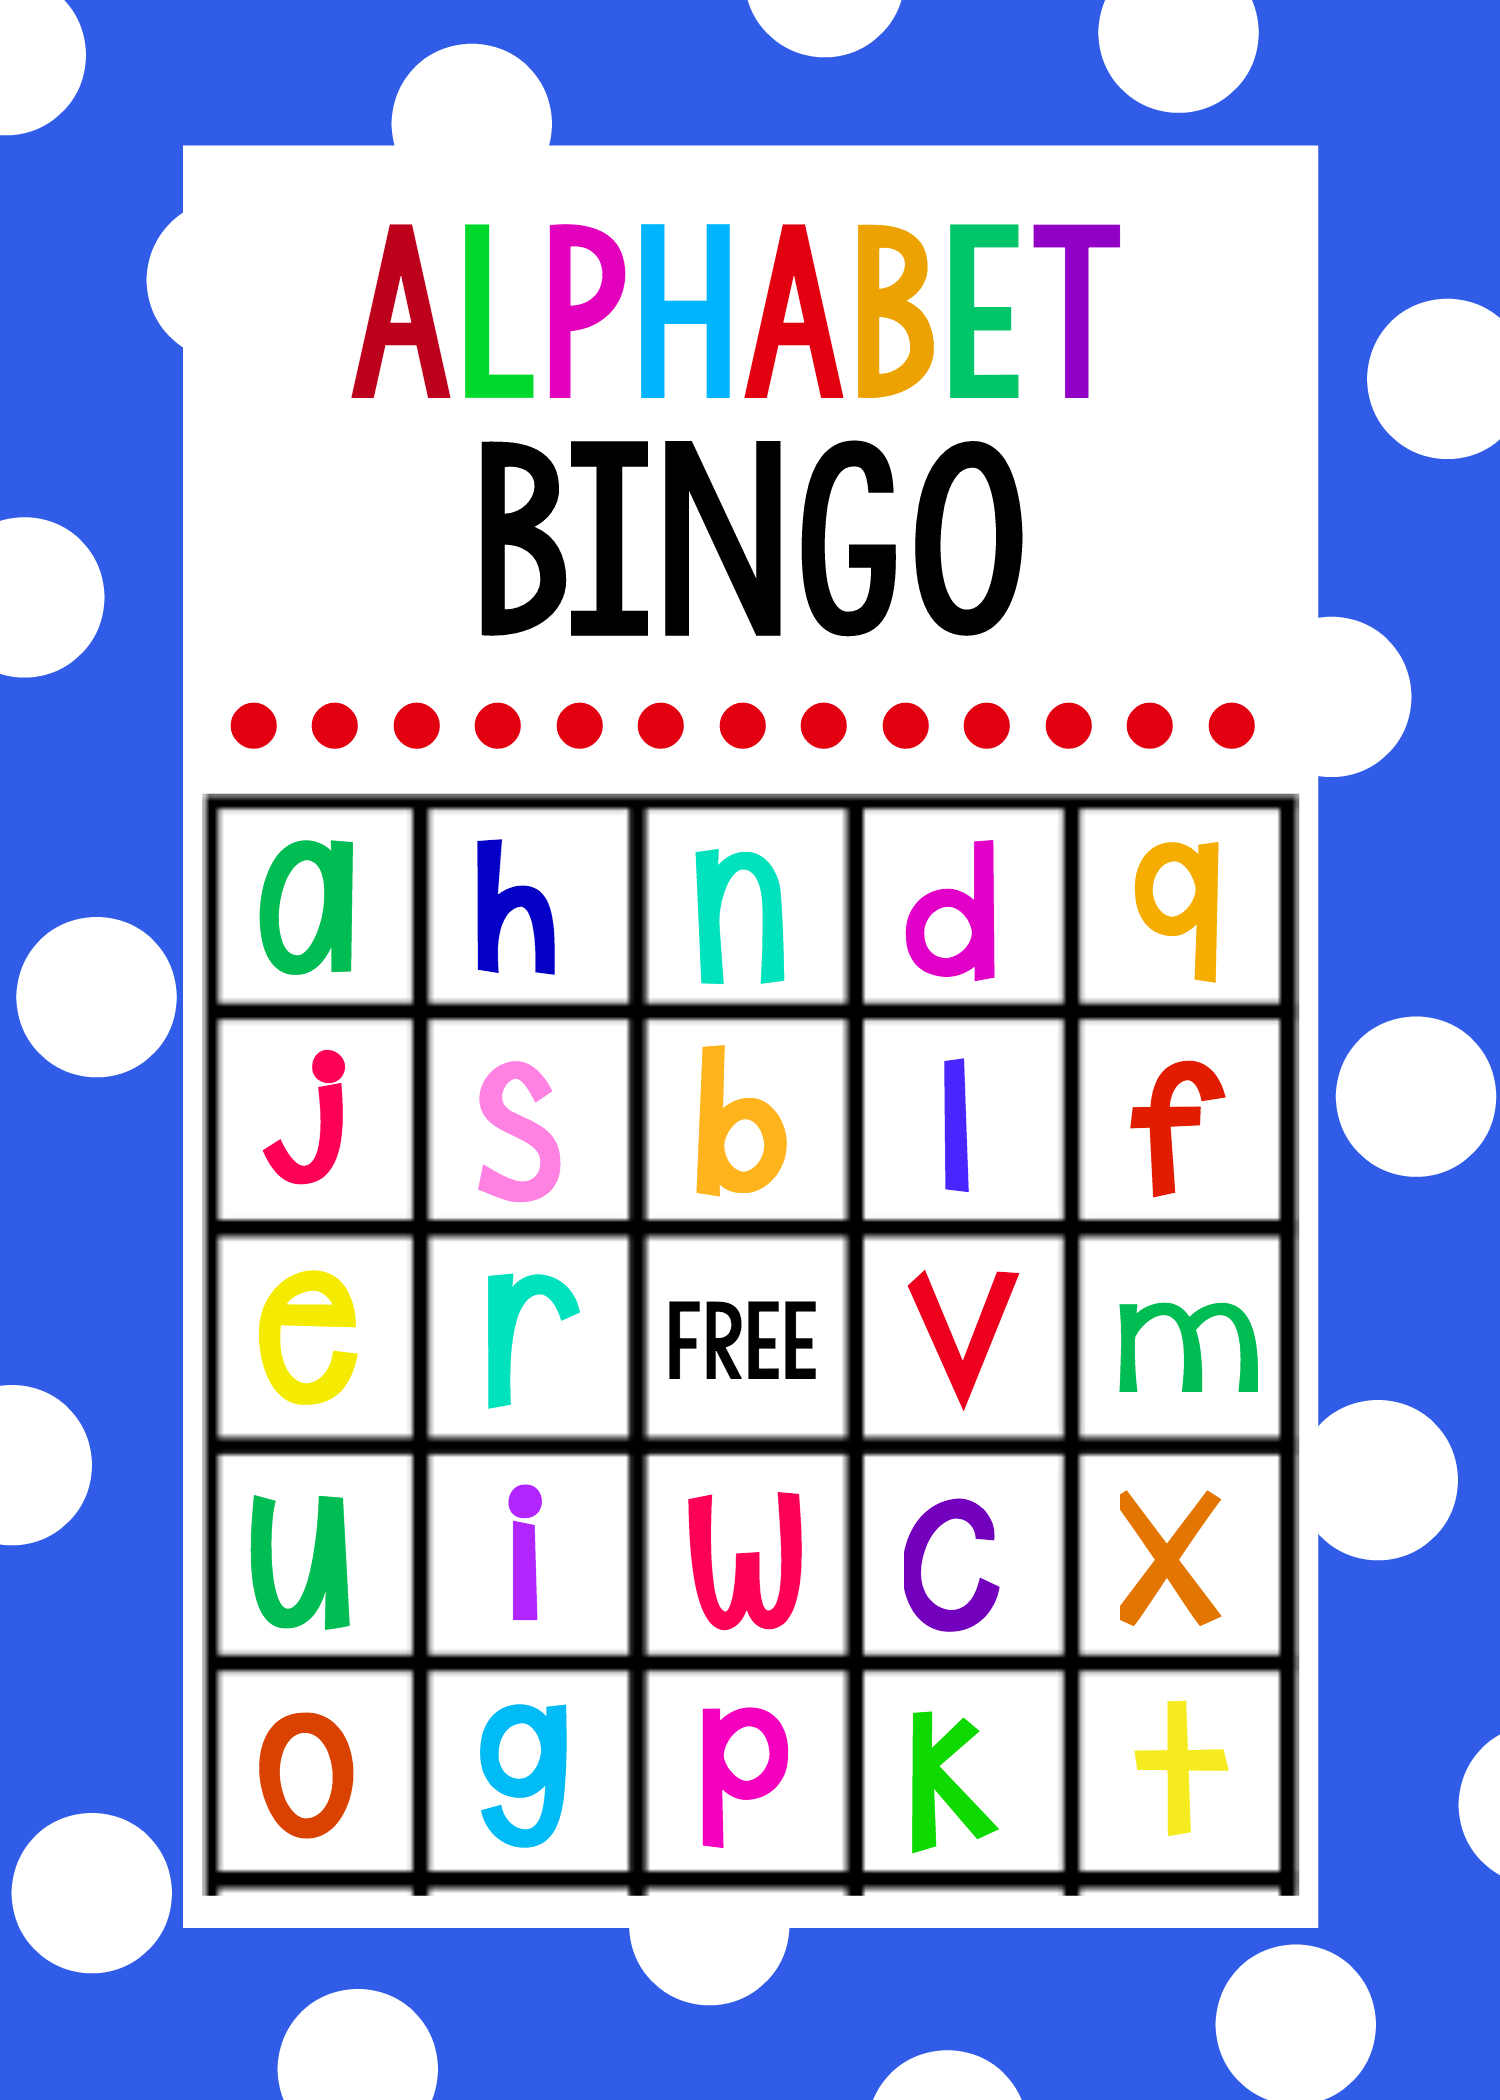 Lowercase Alphabet Bingo Game | Alphabet | Actividades De Ingles - Free Printable Alphabet Bingo Cards